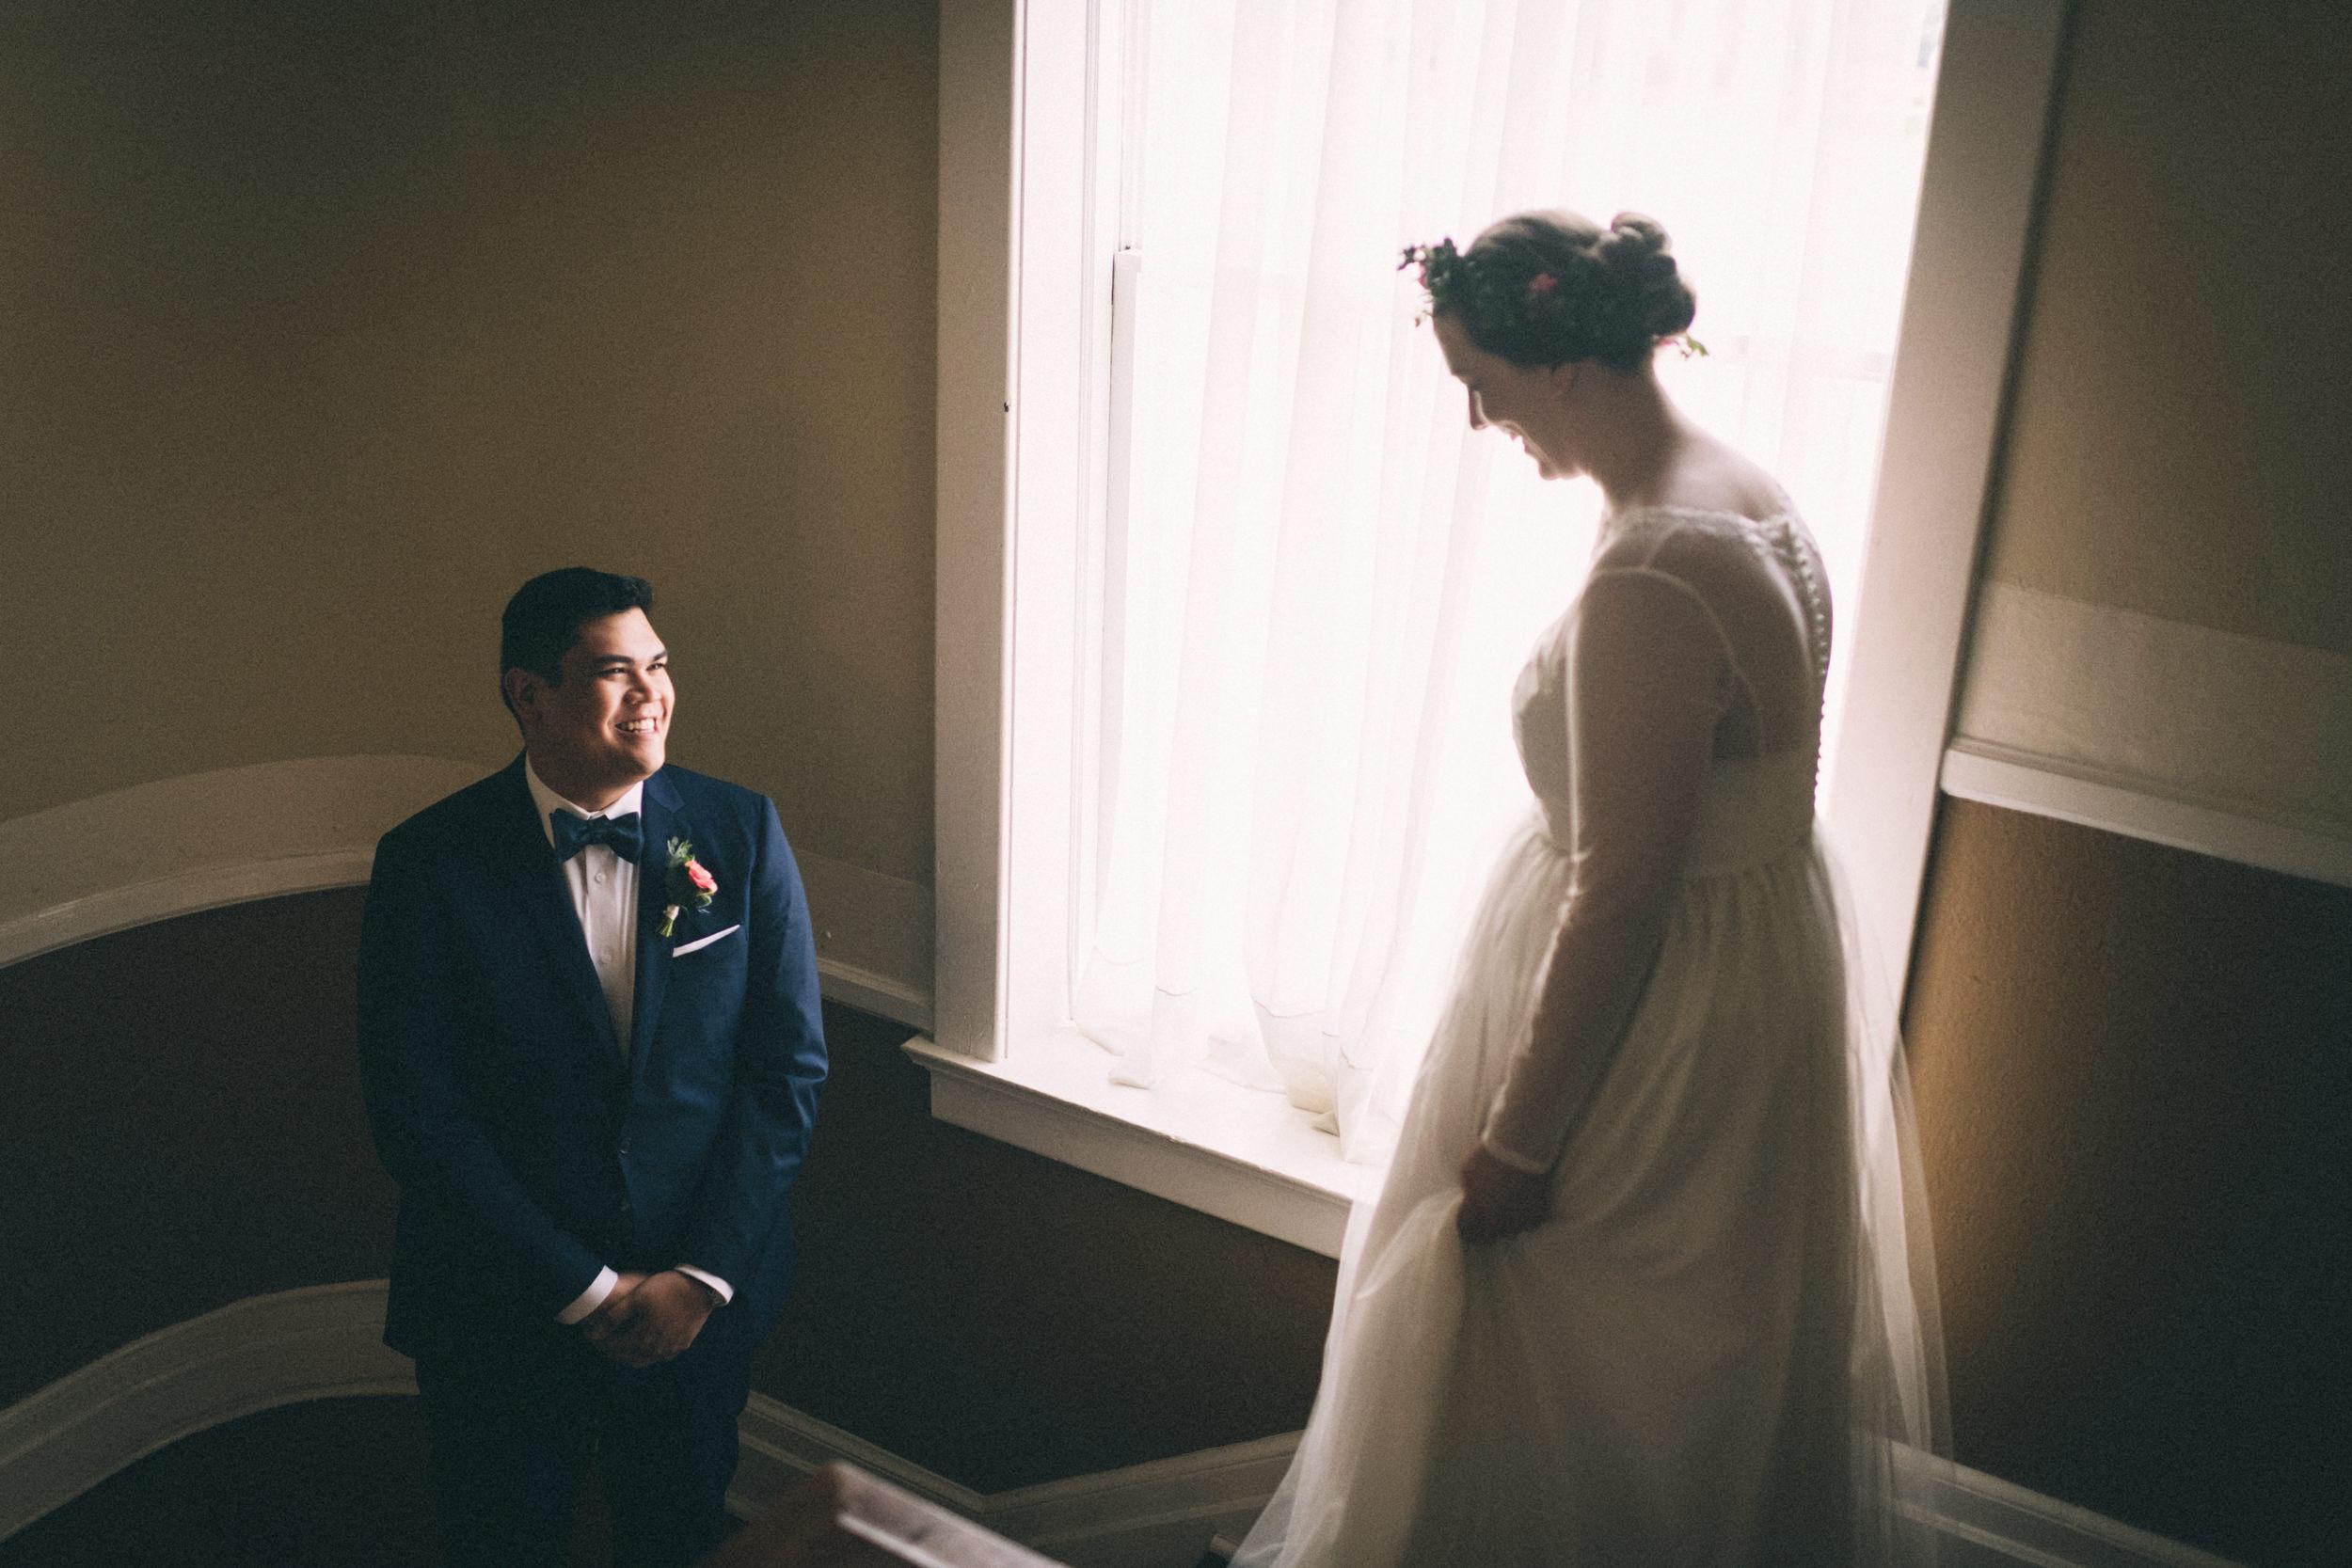 lauren-dean-wedding-grand-lodge-kentucky-sarah-katherine-davis-photography-135edit.jpg